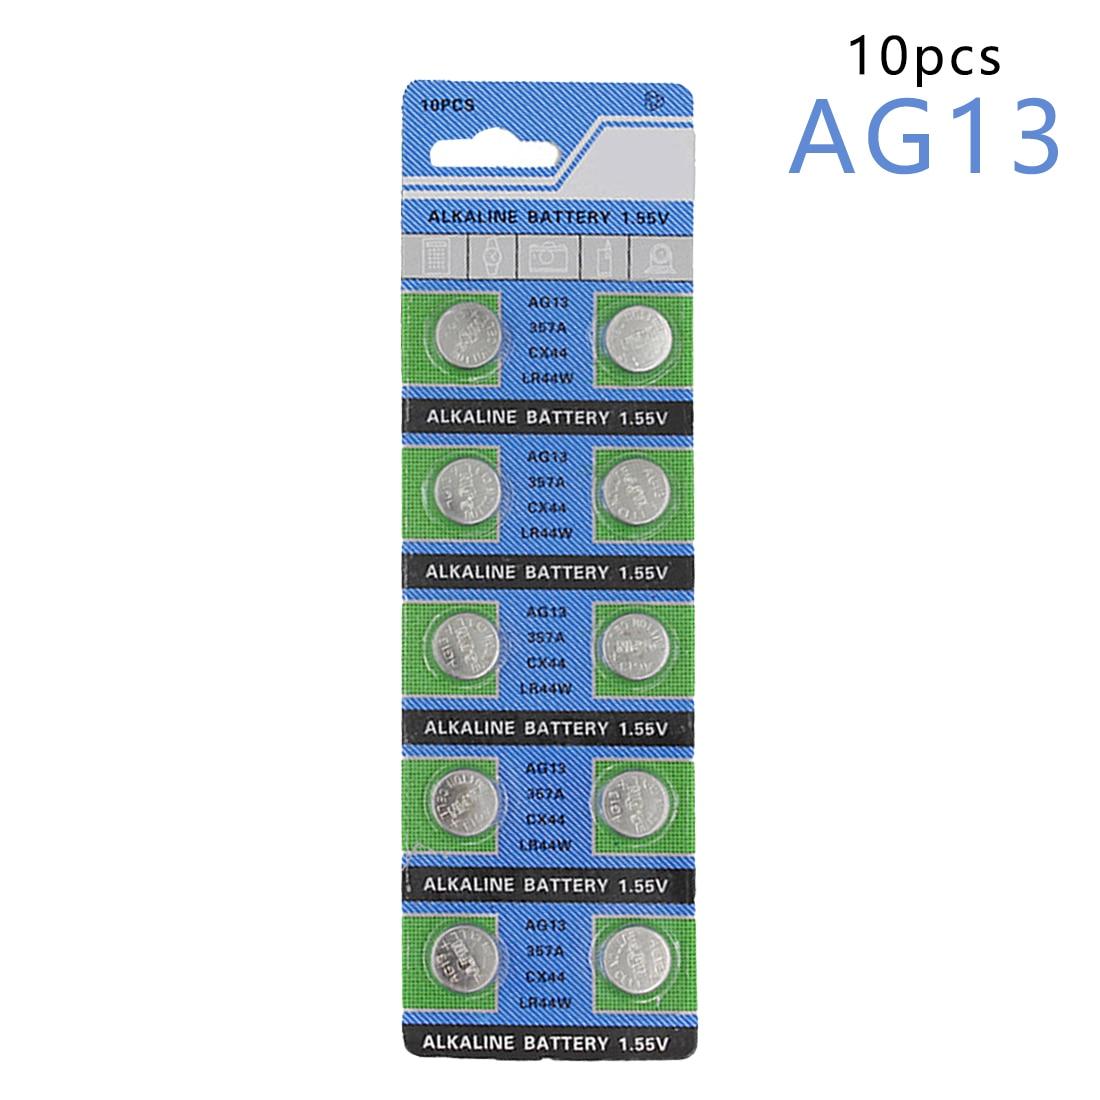 цена на Centechia New Arrival 10 Pcs AG13 LR44 357A S76E G13 Button Coin Cell Battery Batteries 1.55V Alkaline